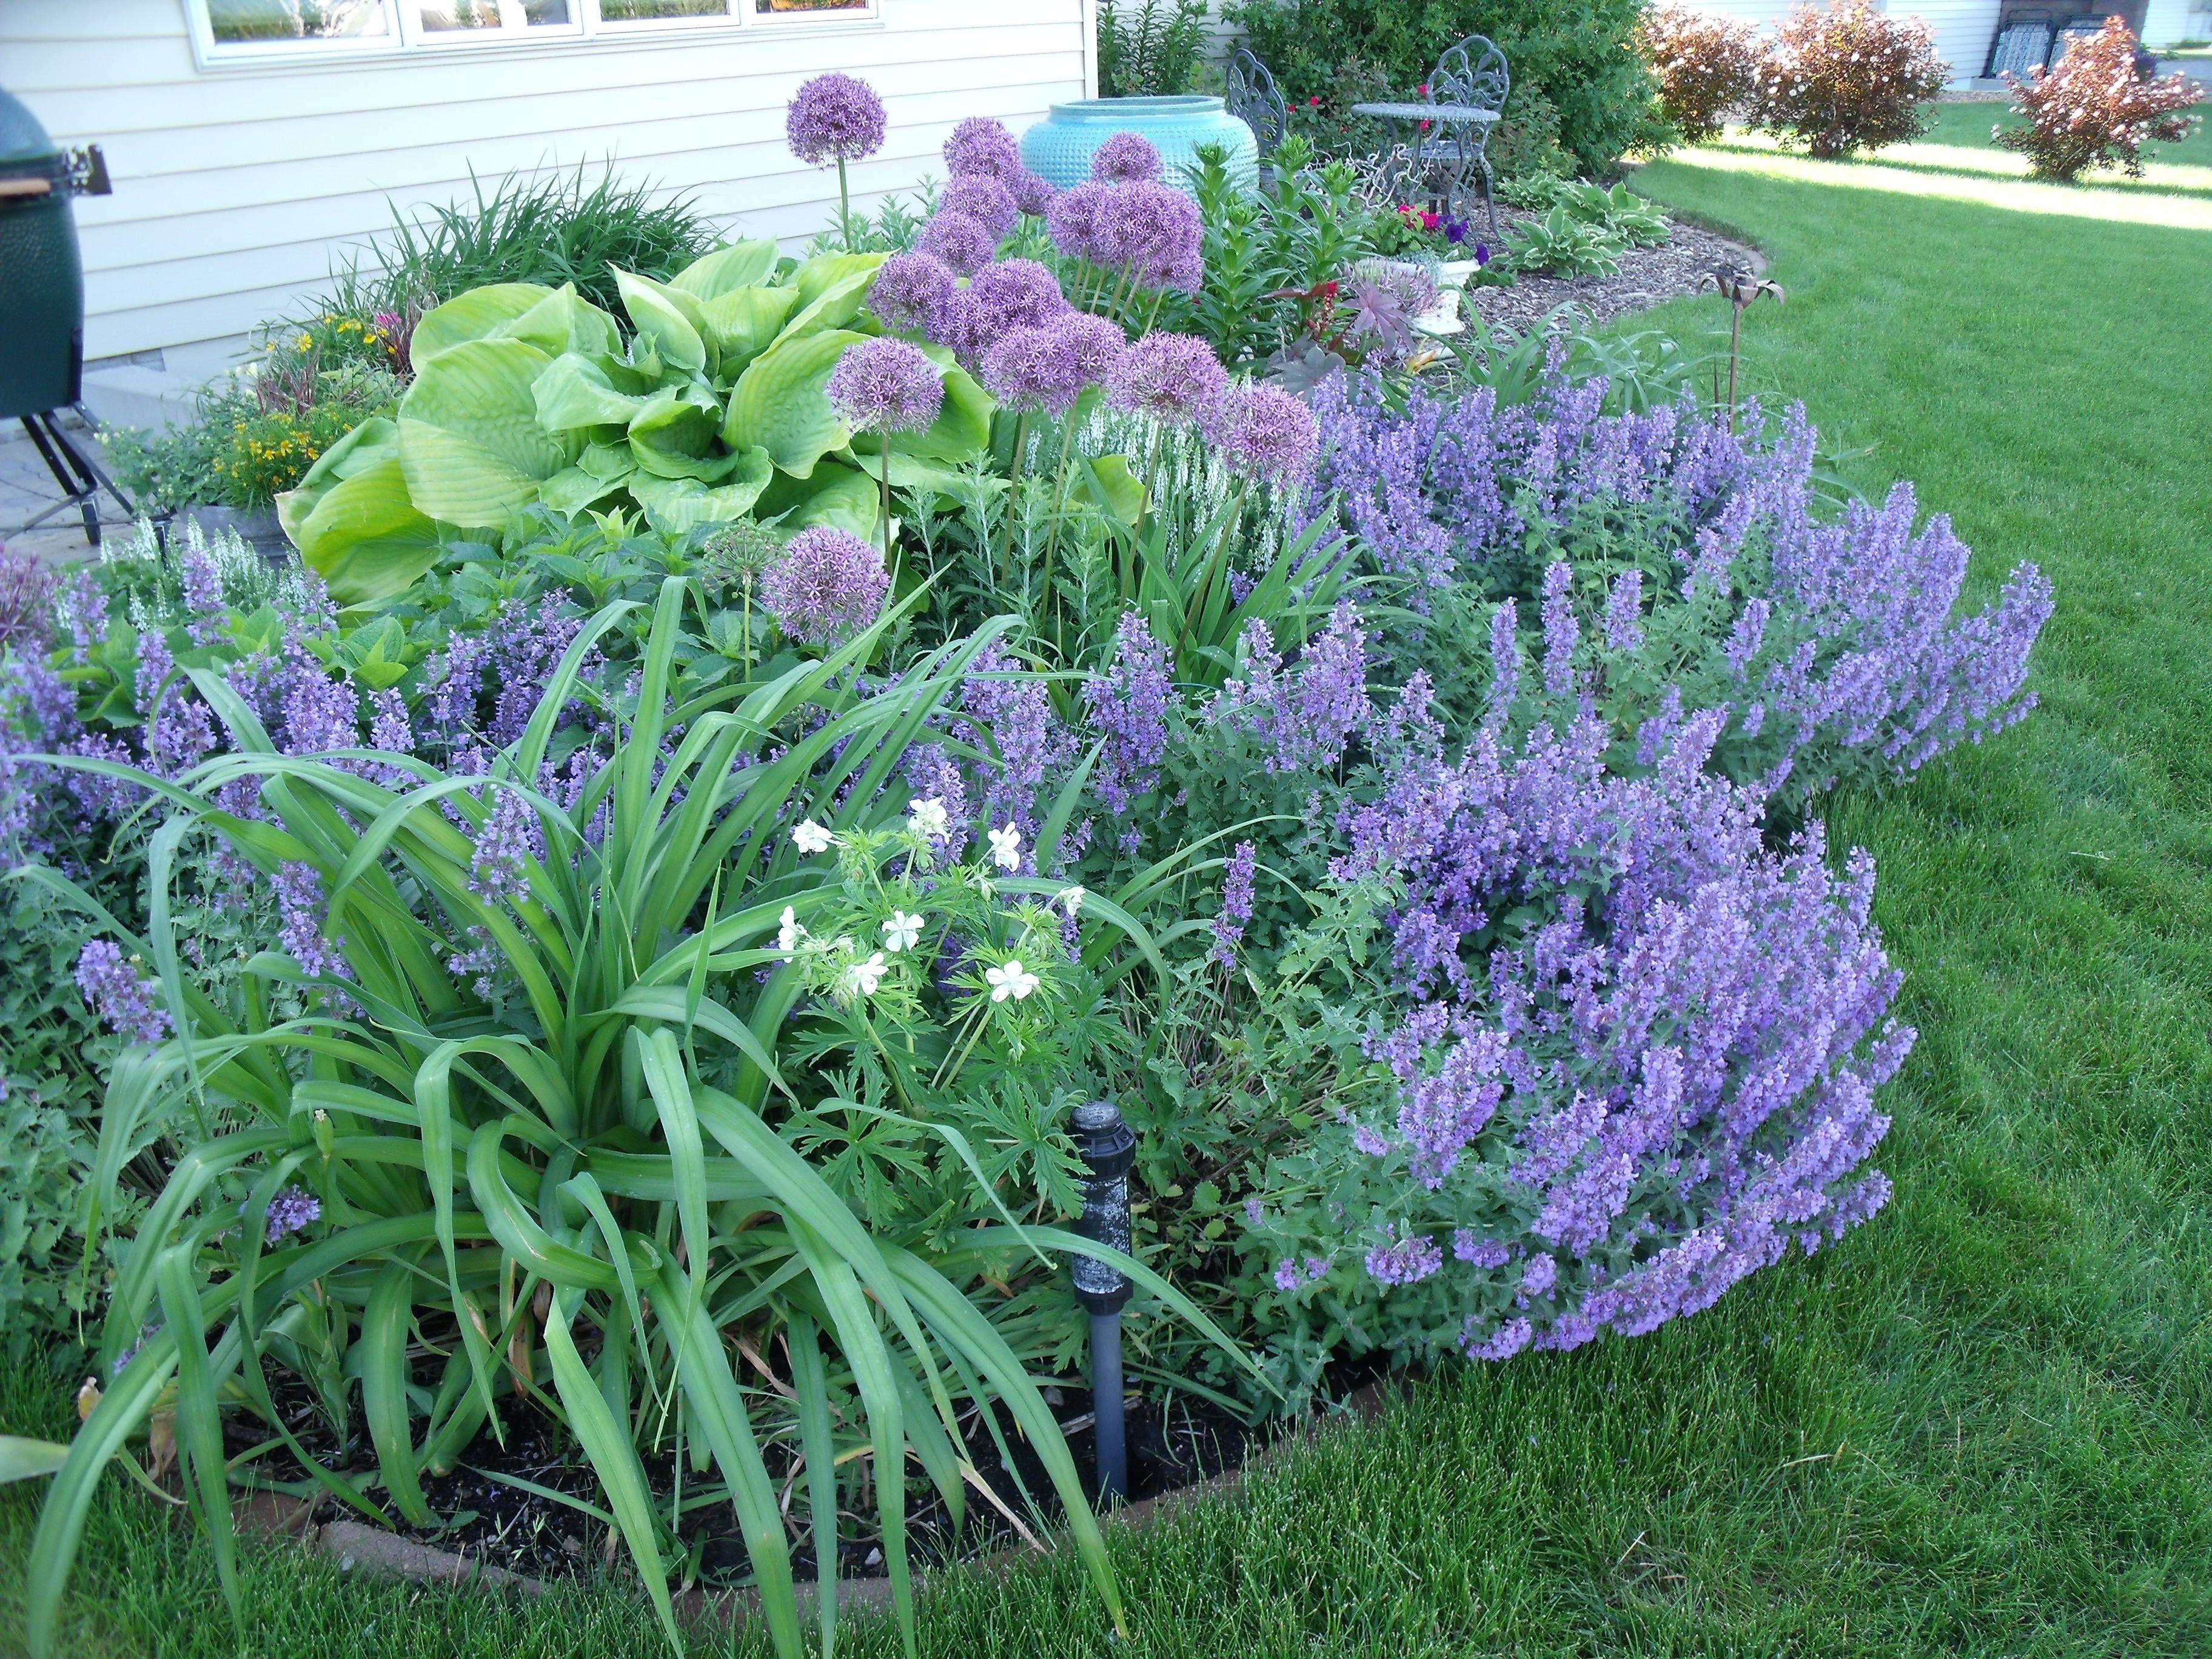 Walkers Low Catmint, hosta, etc. | My garden | Pinterest | Gardens ...